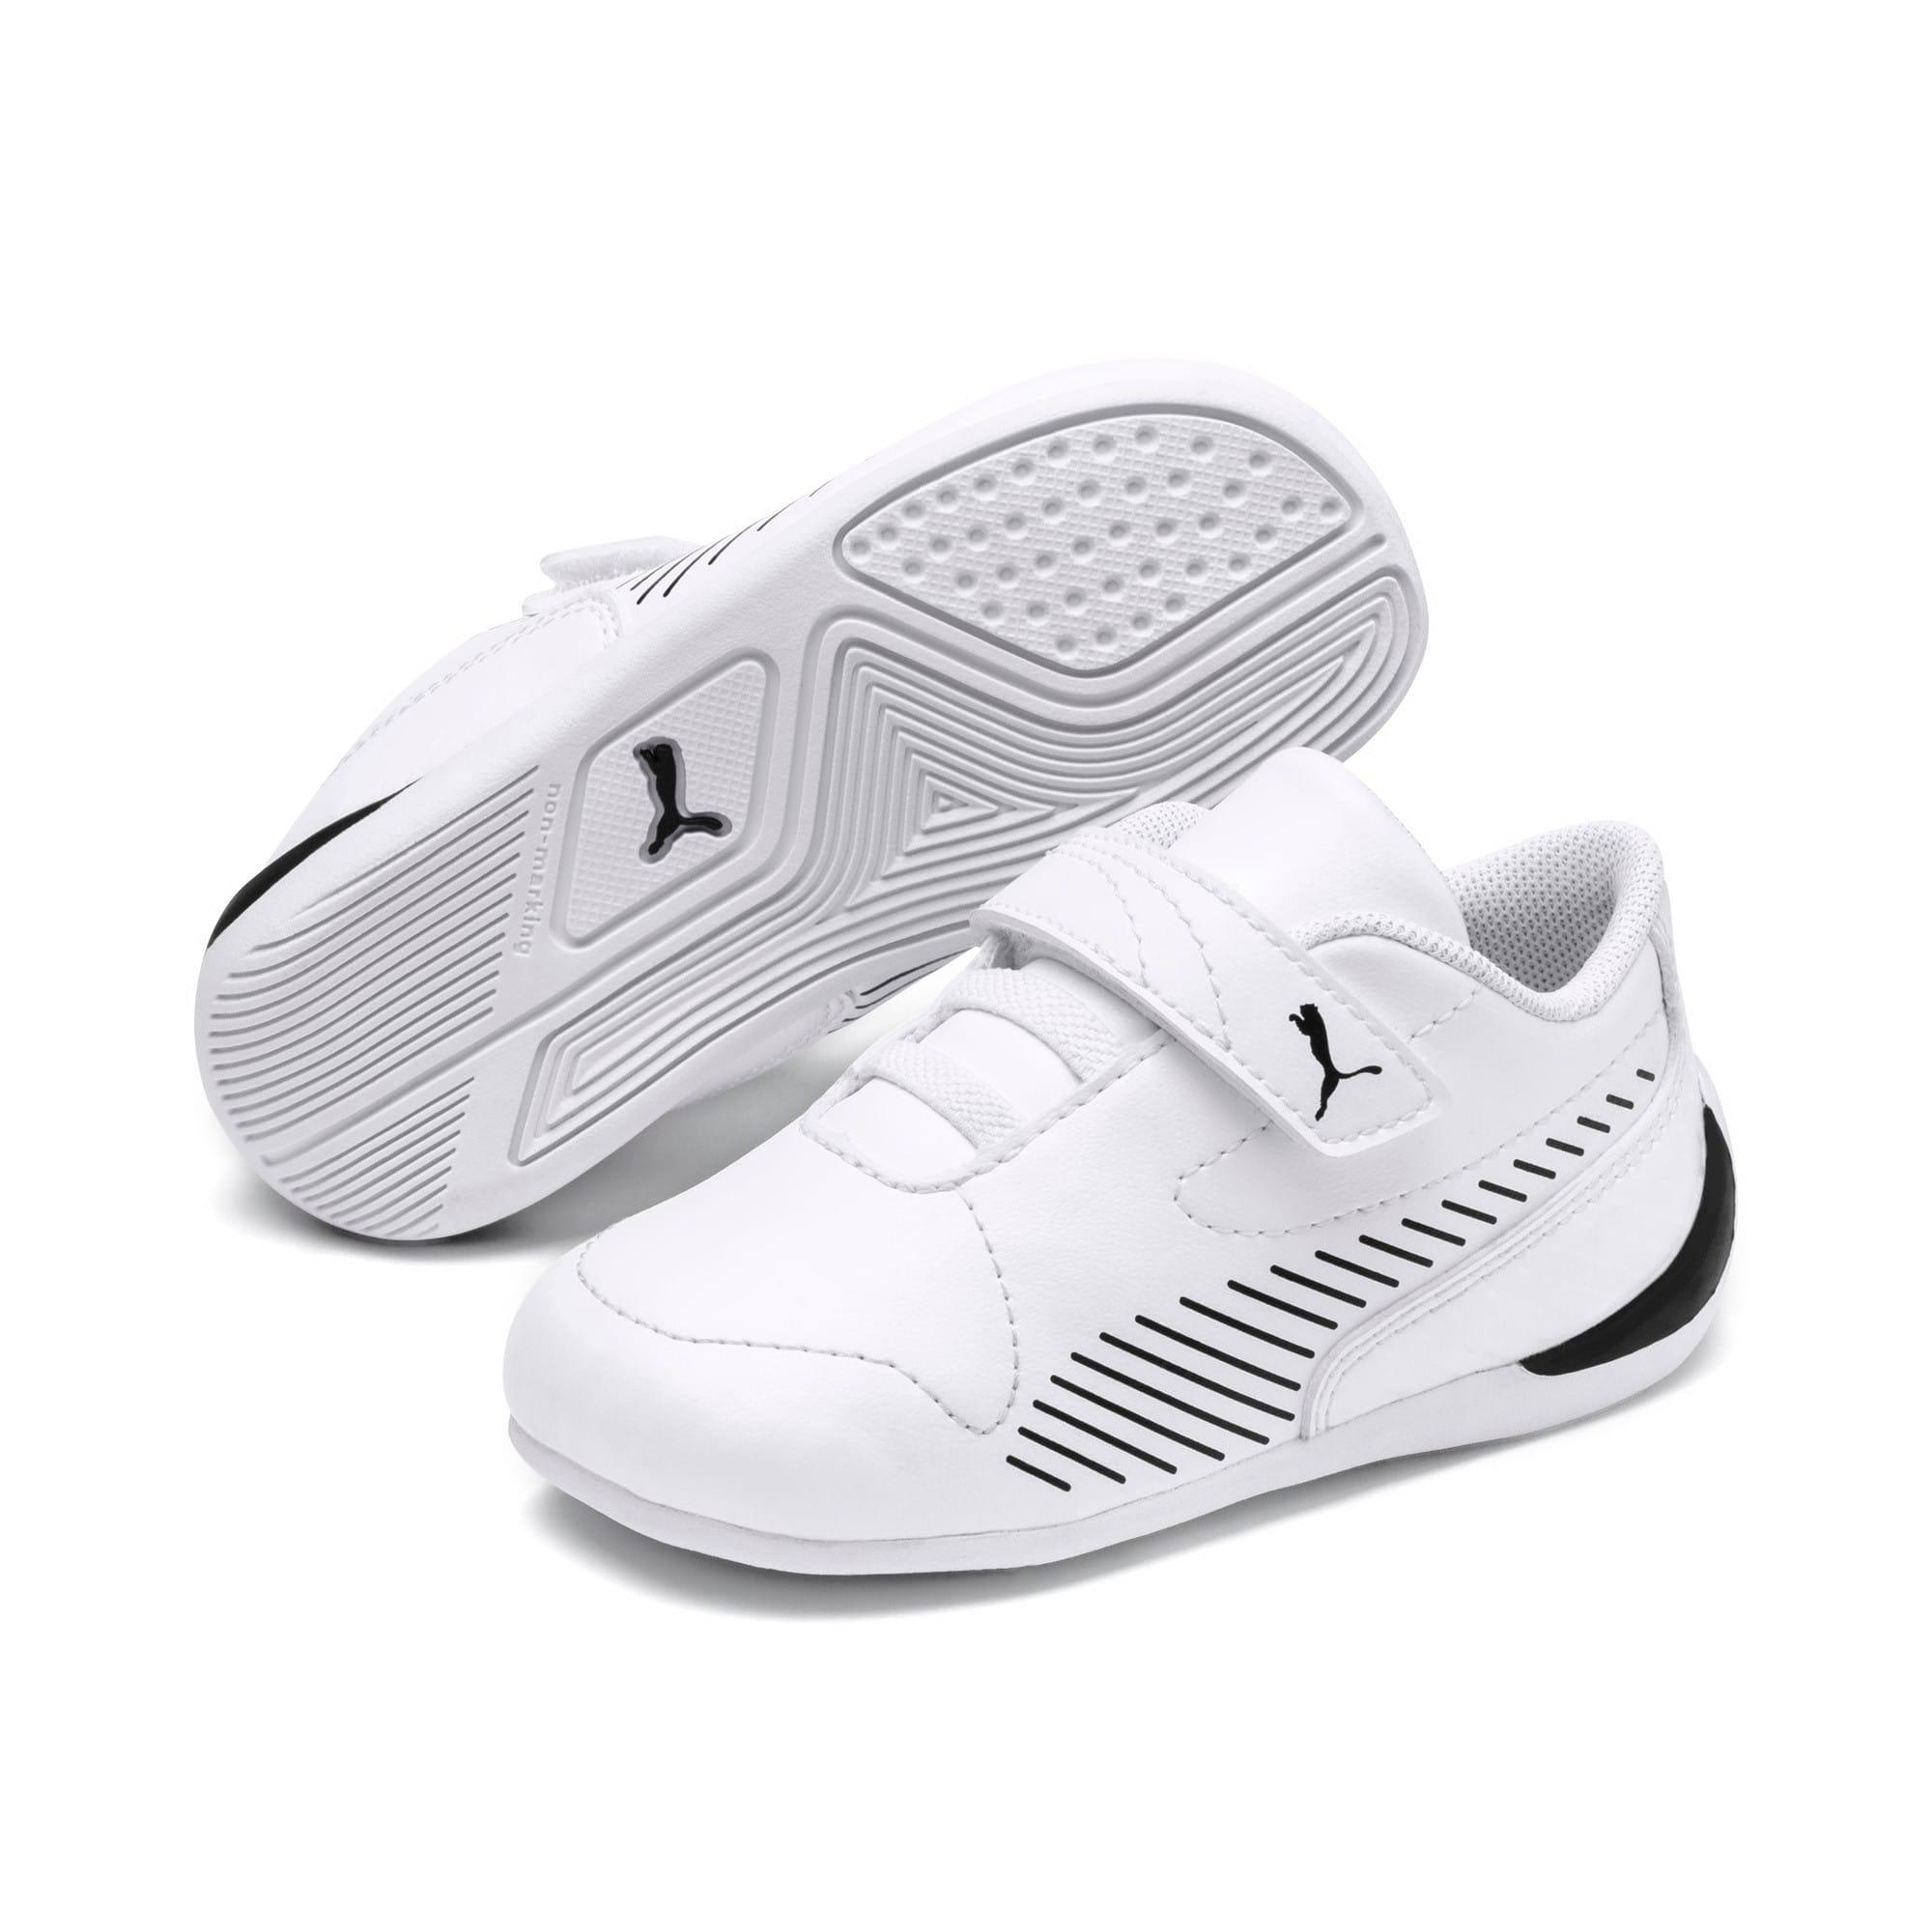 Thumbnail 2 of Scuderia Ferrari Drift Cat 7S Ultra Toddler Shoes, Puma White-Puma Black, medium